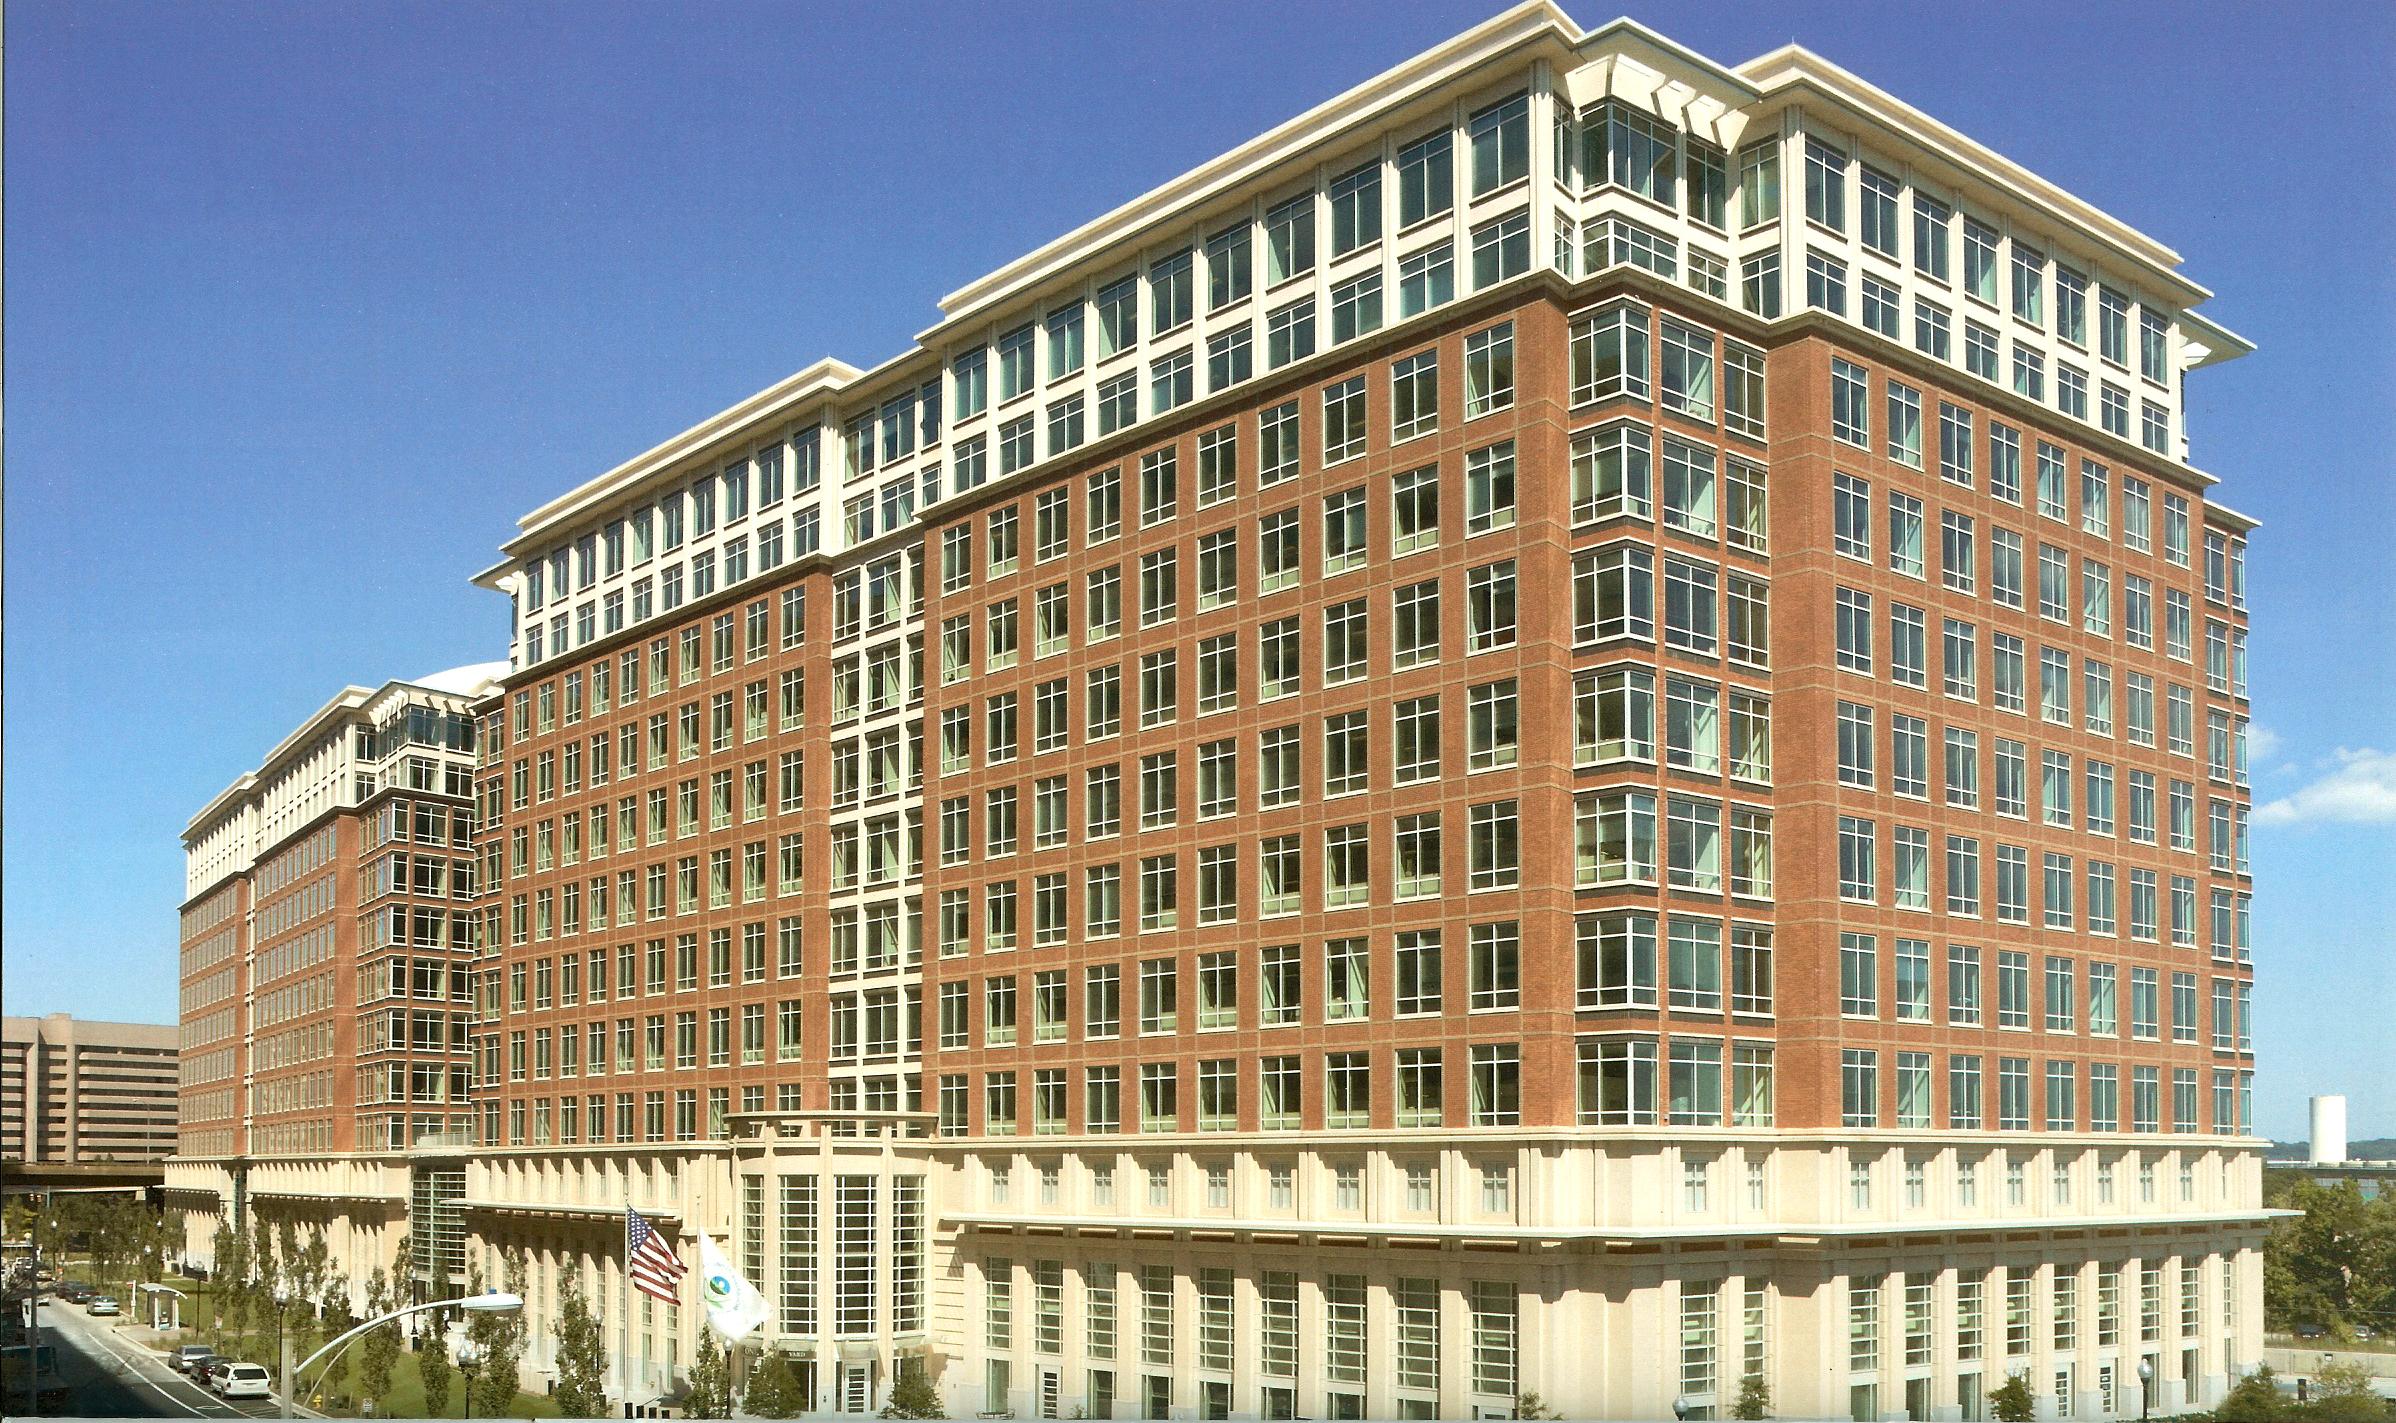 Potomac Yard